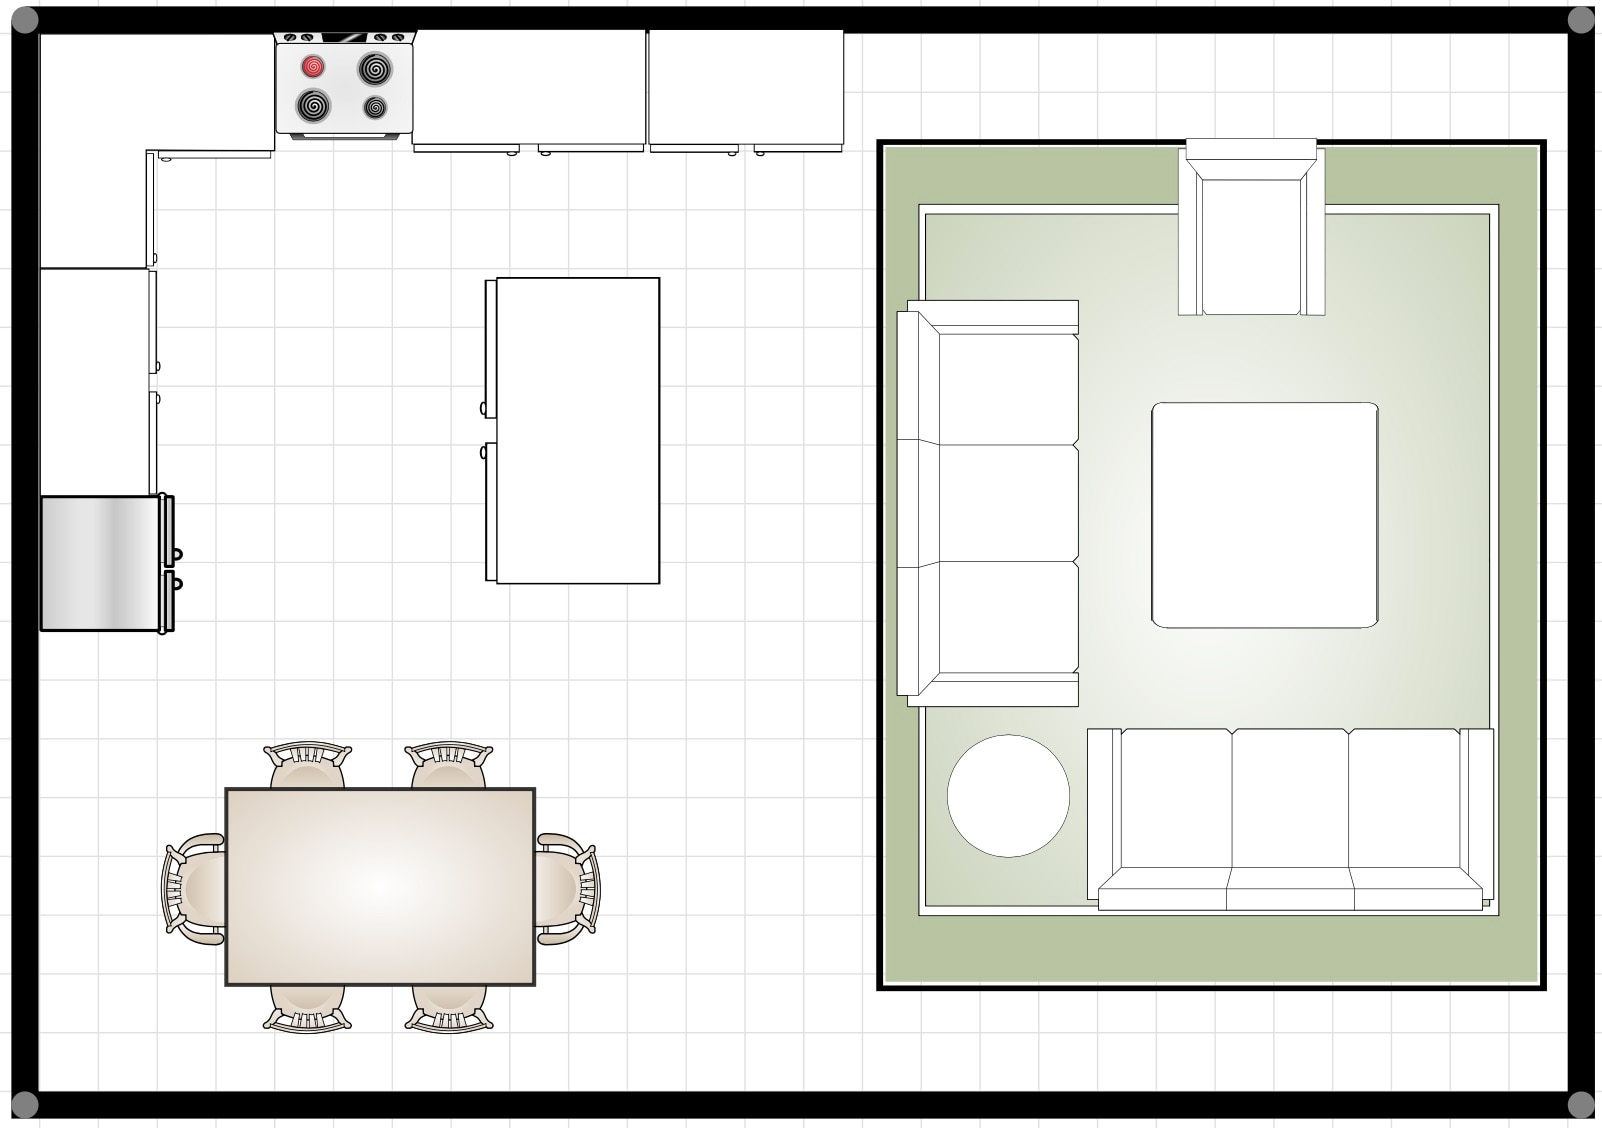 How to arrange furniture for open floor plan arranging - Planning living room furniture layout ...